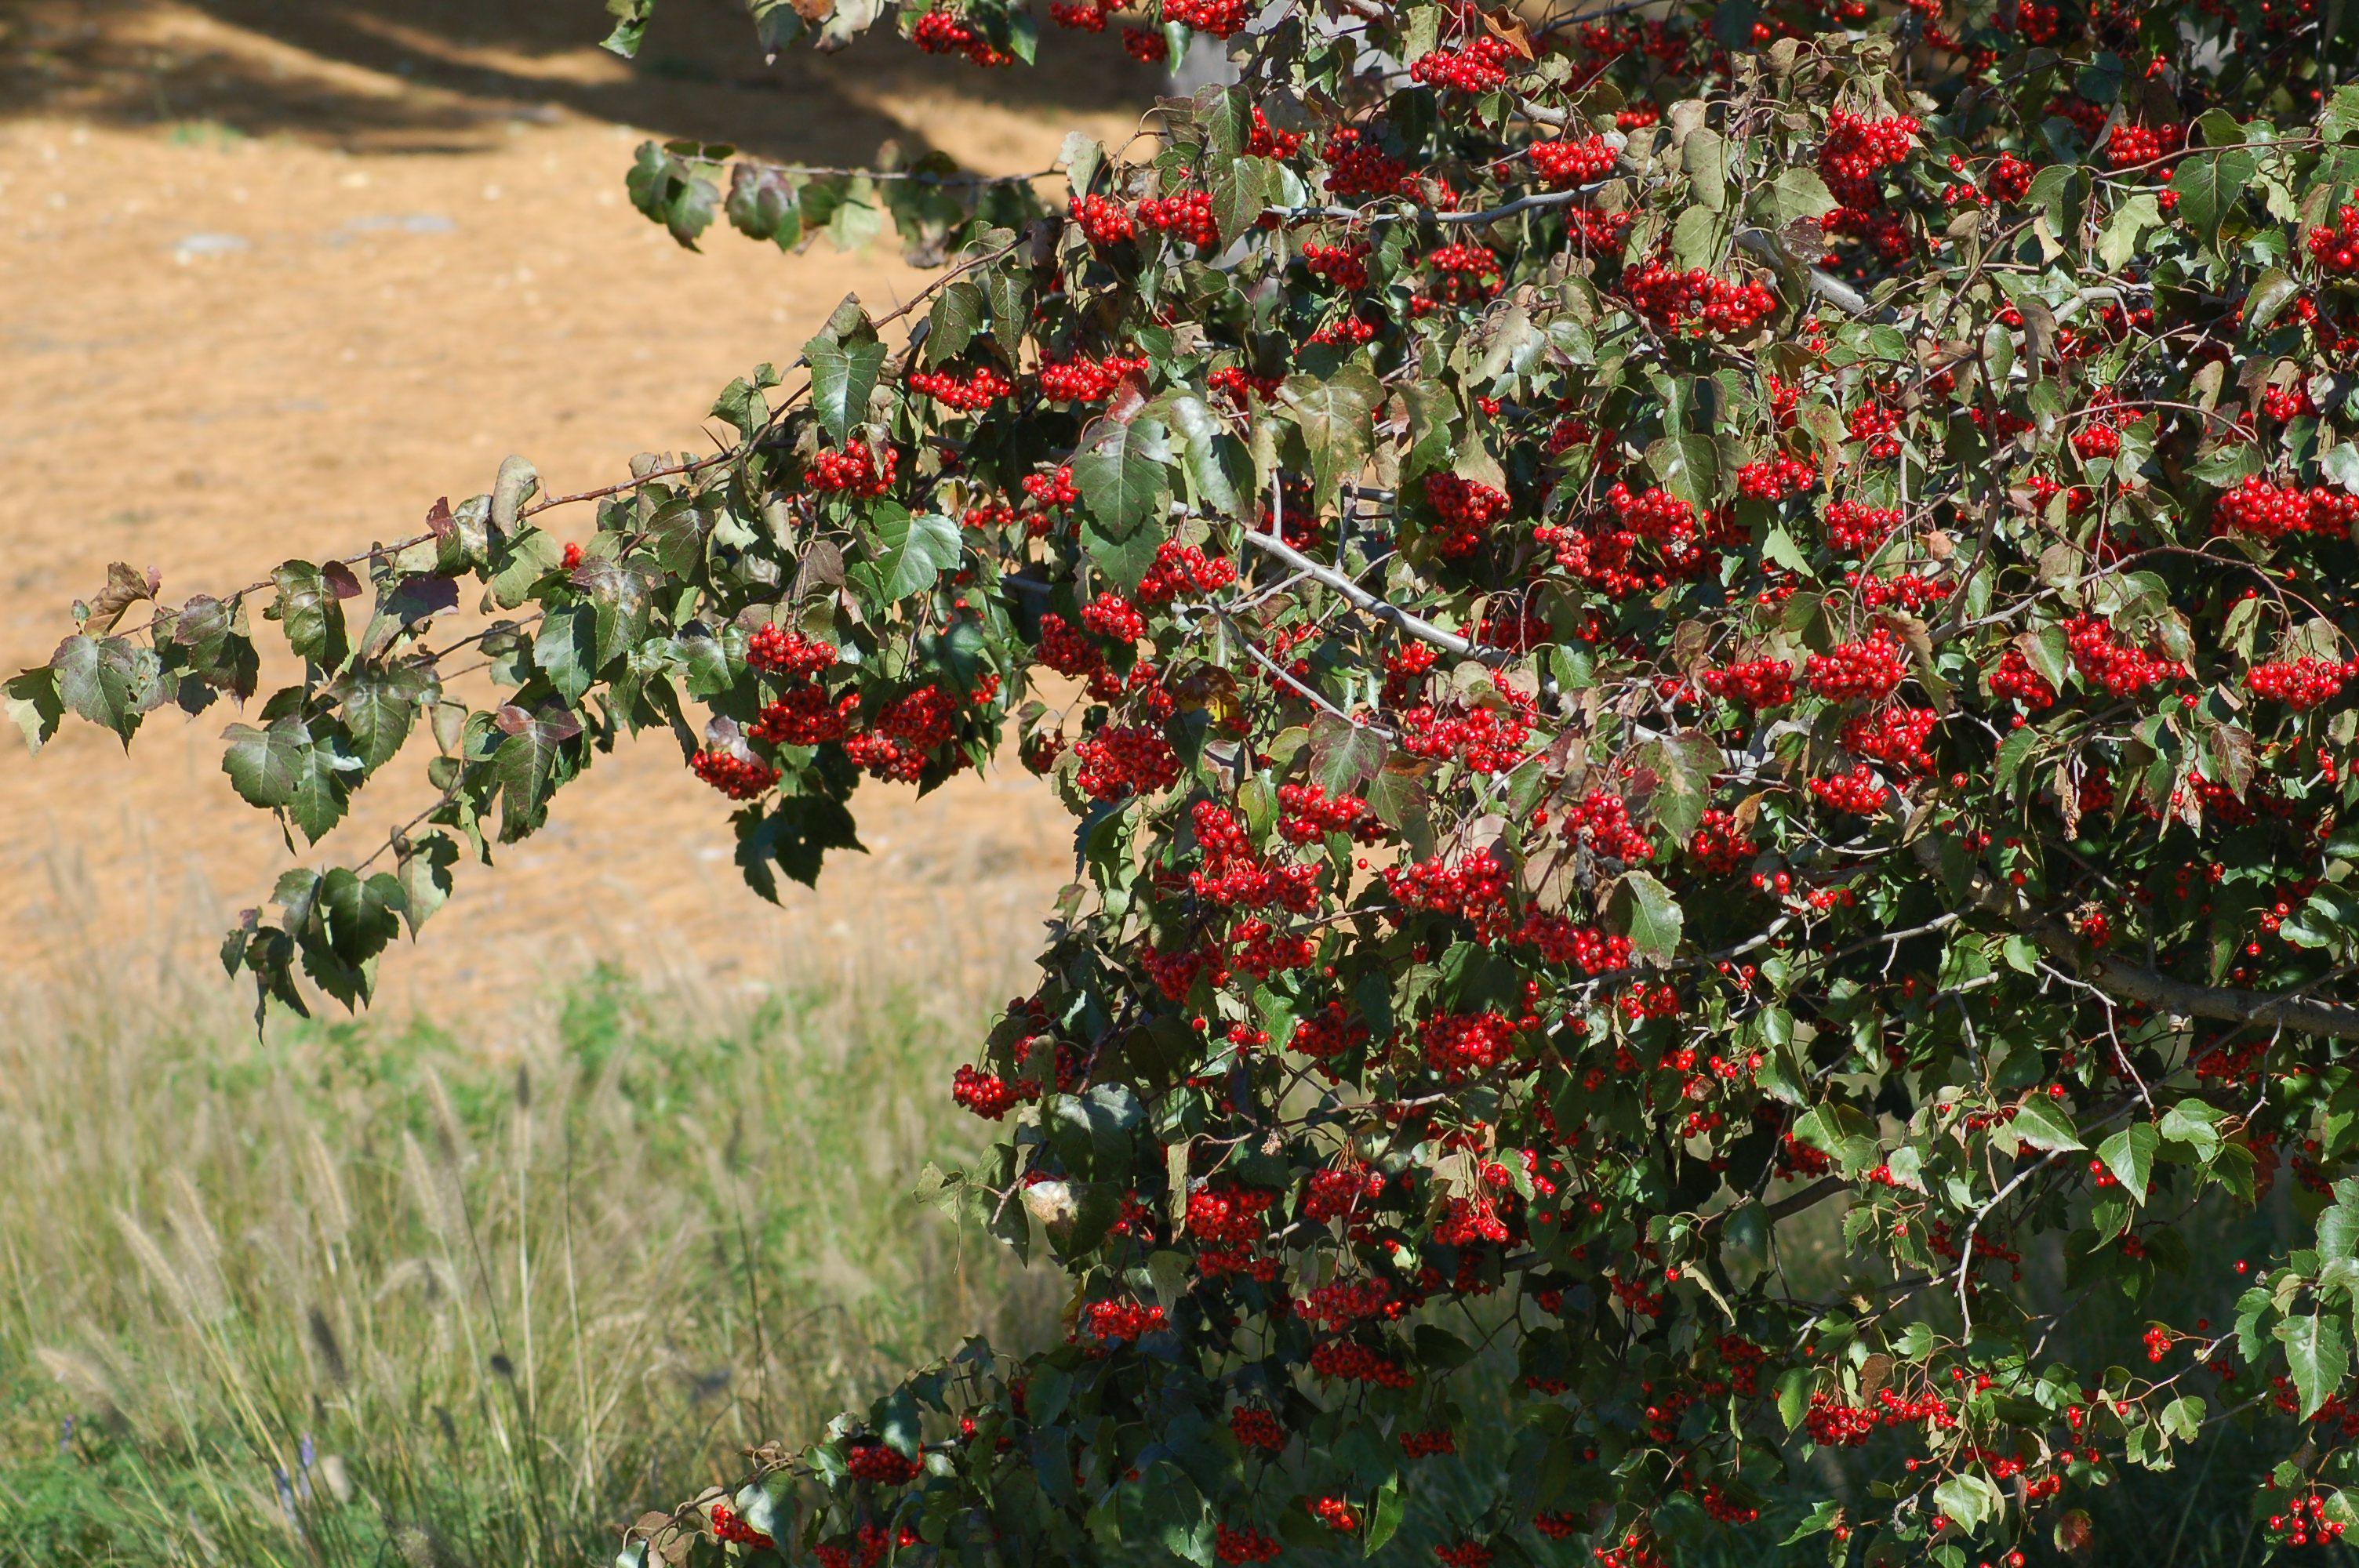 Washington hawthorn tree with berries